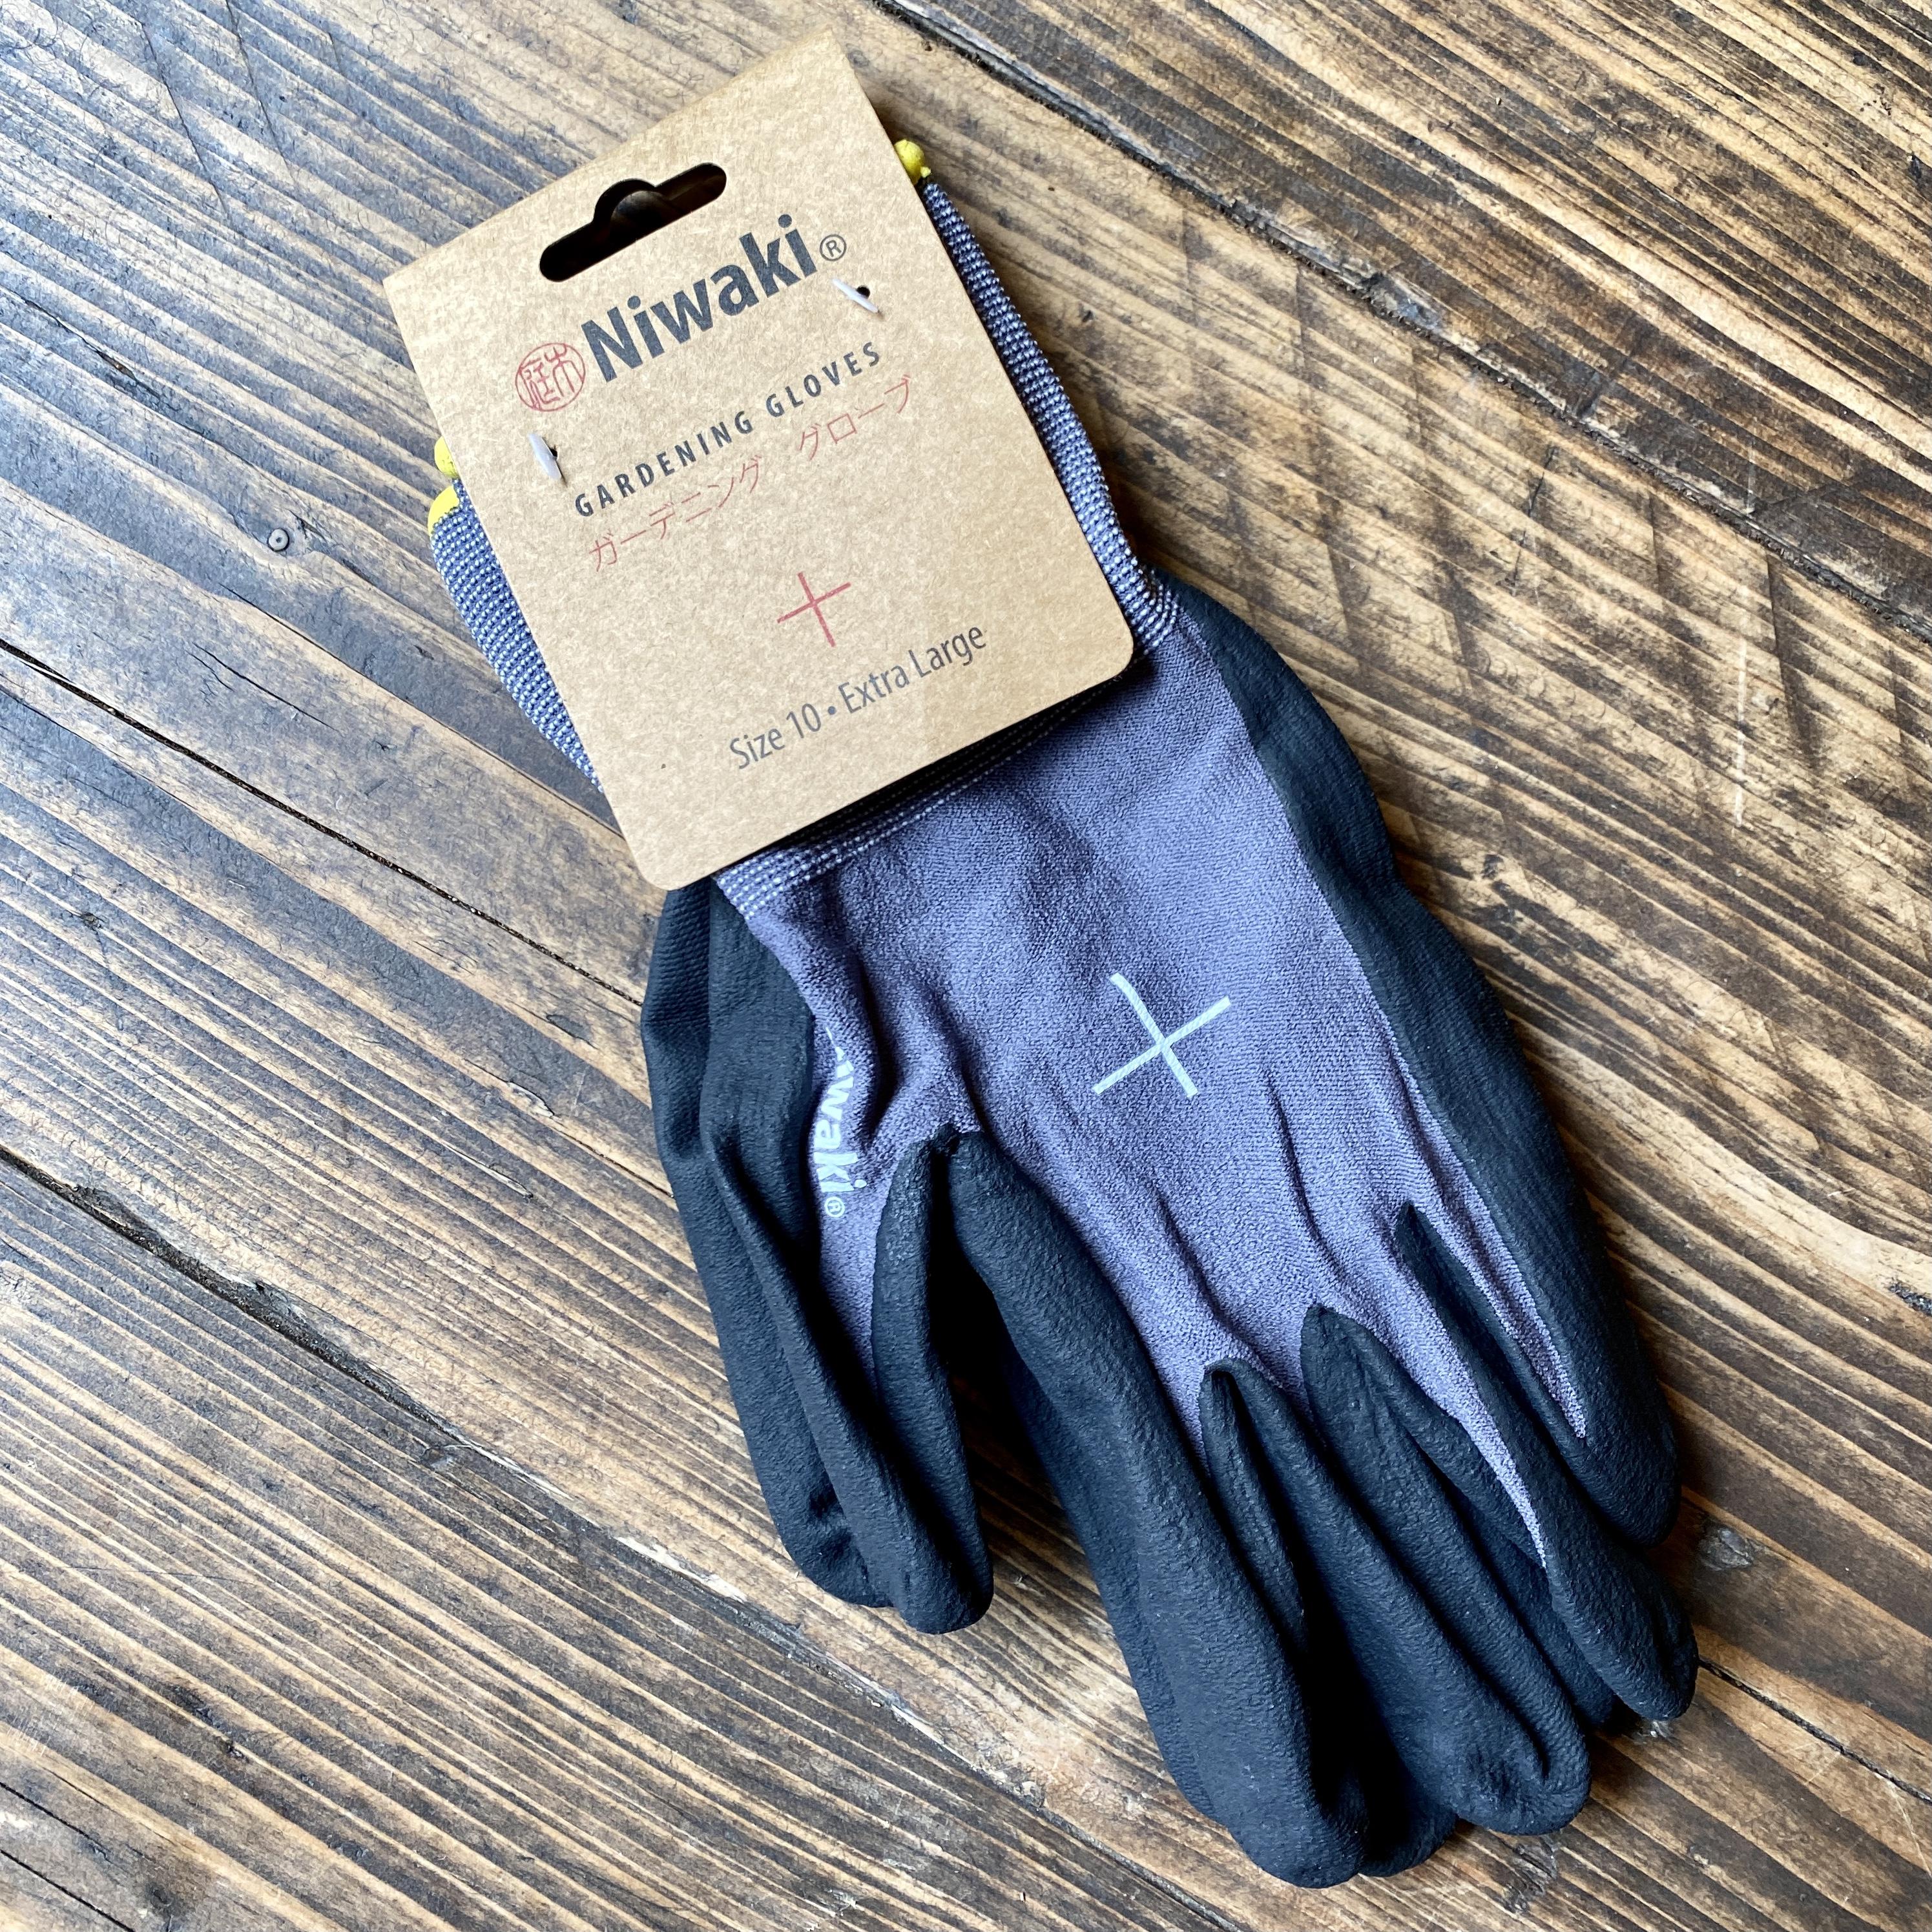 Niwaki Gardening Gloves